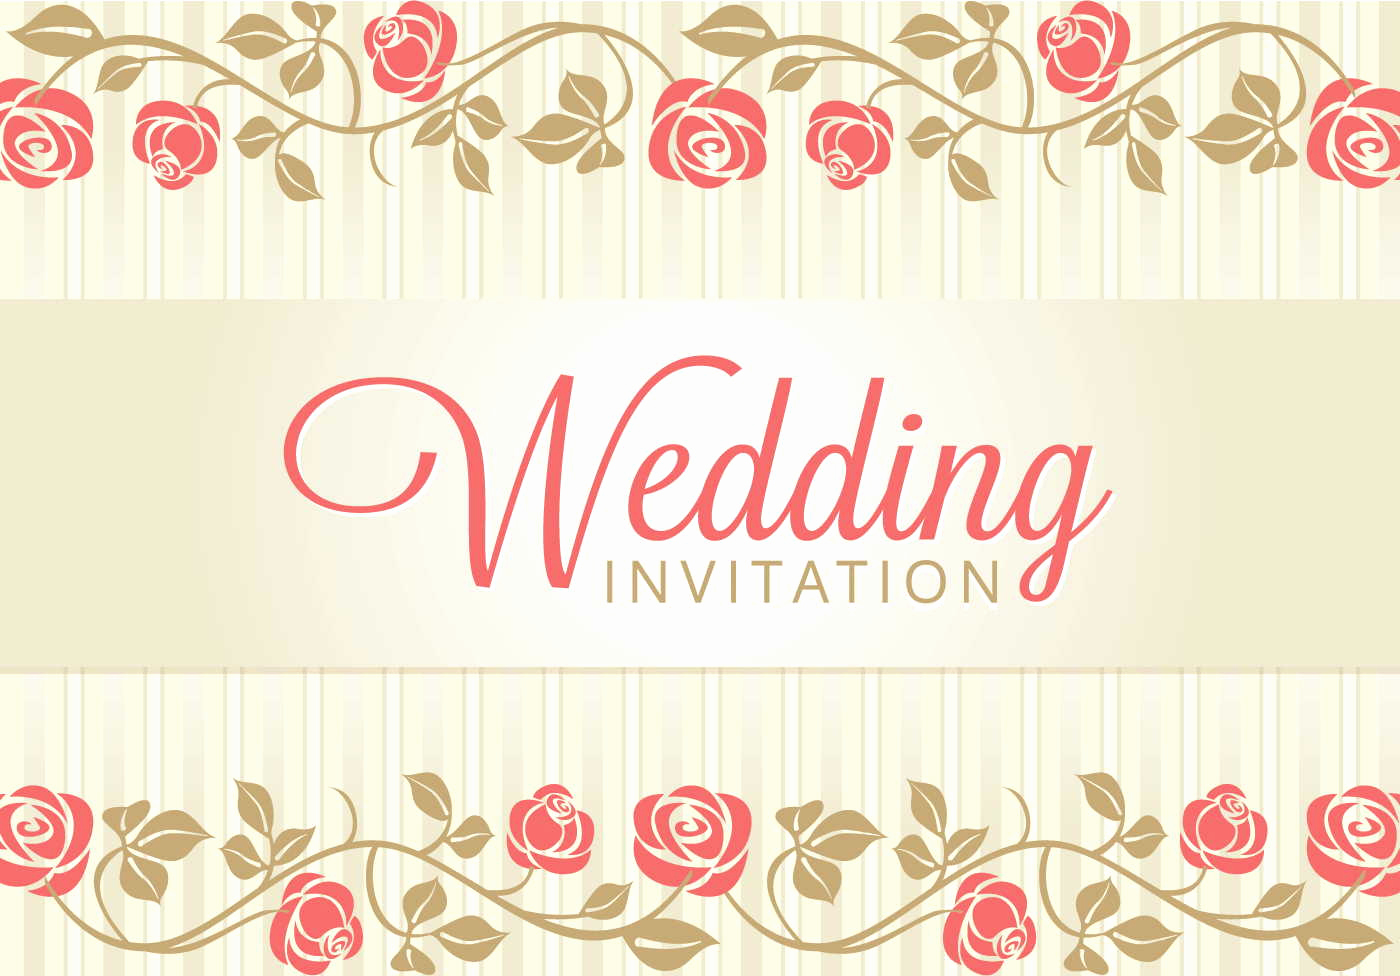 Wedding Invitation Background Designs Inspirational Vintage Wedding Backgrounds